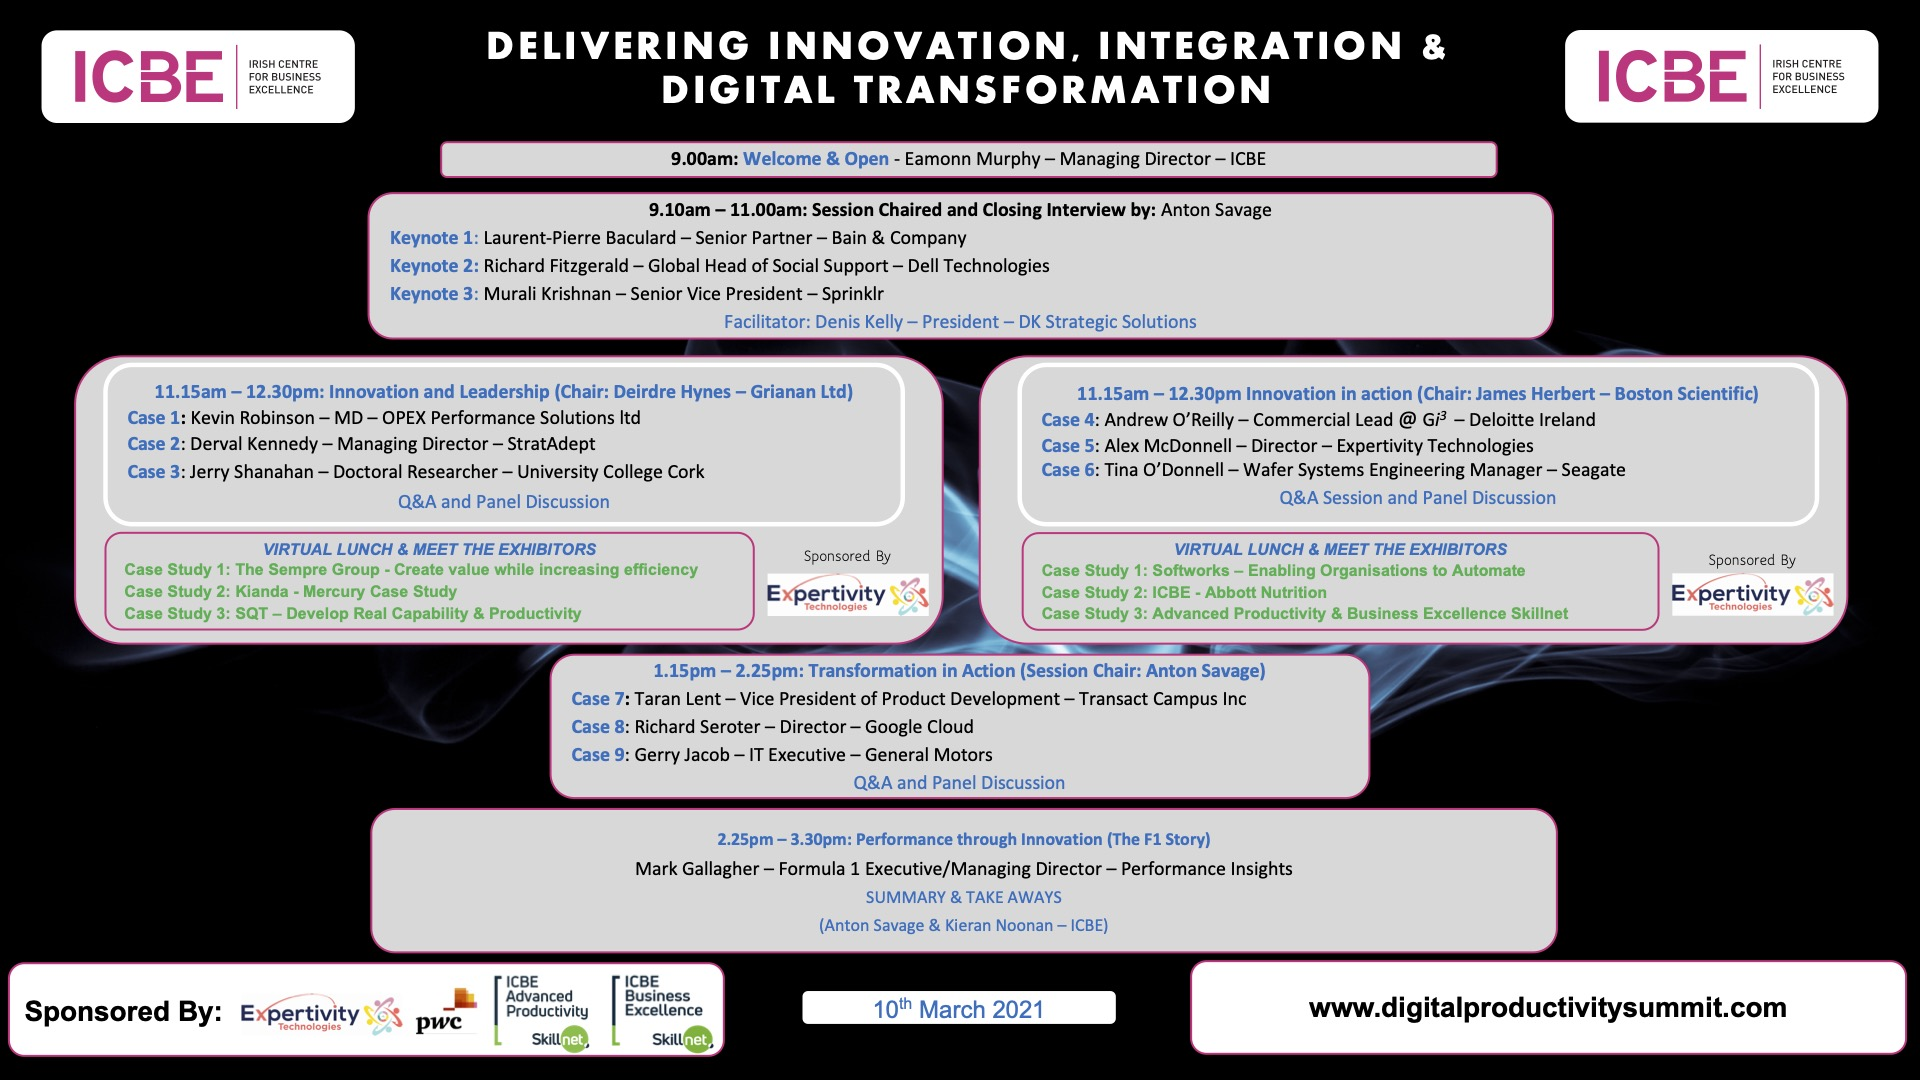 ICBE Conference Agenda 20216 copy